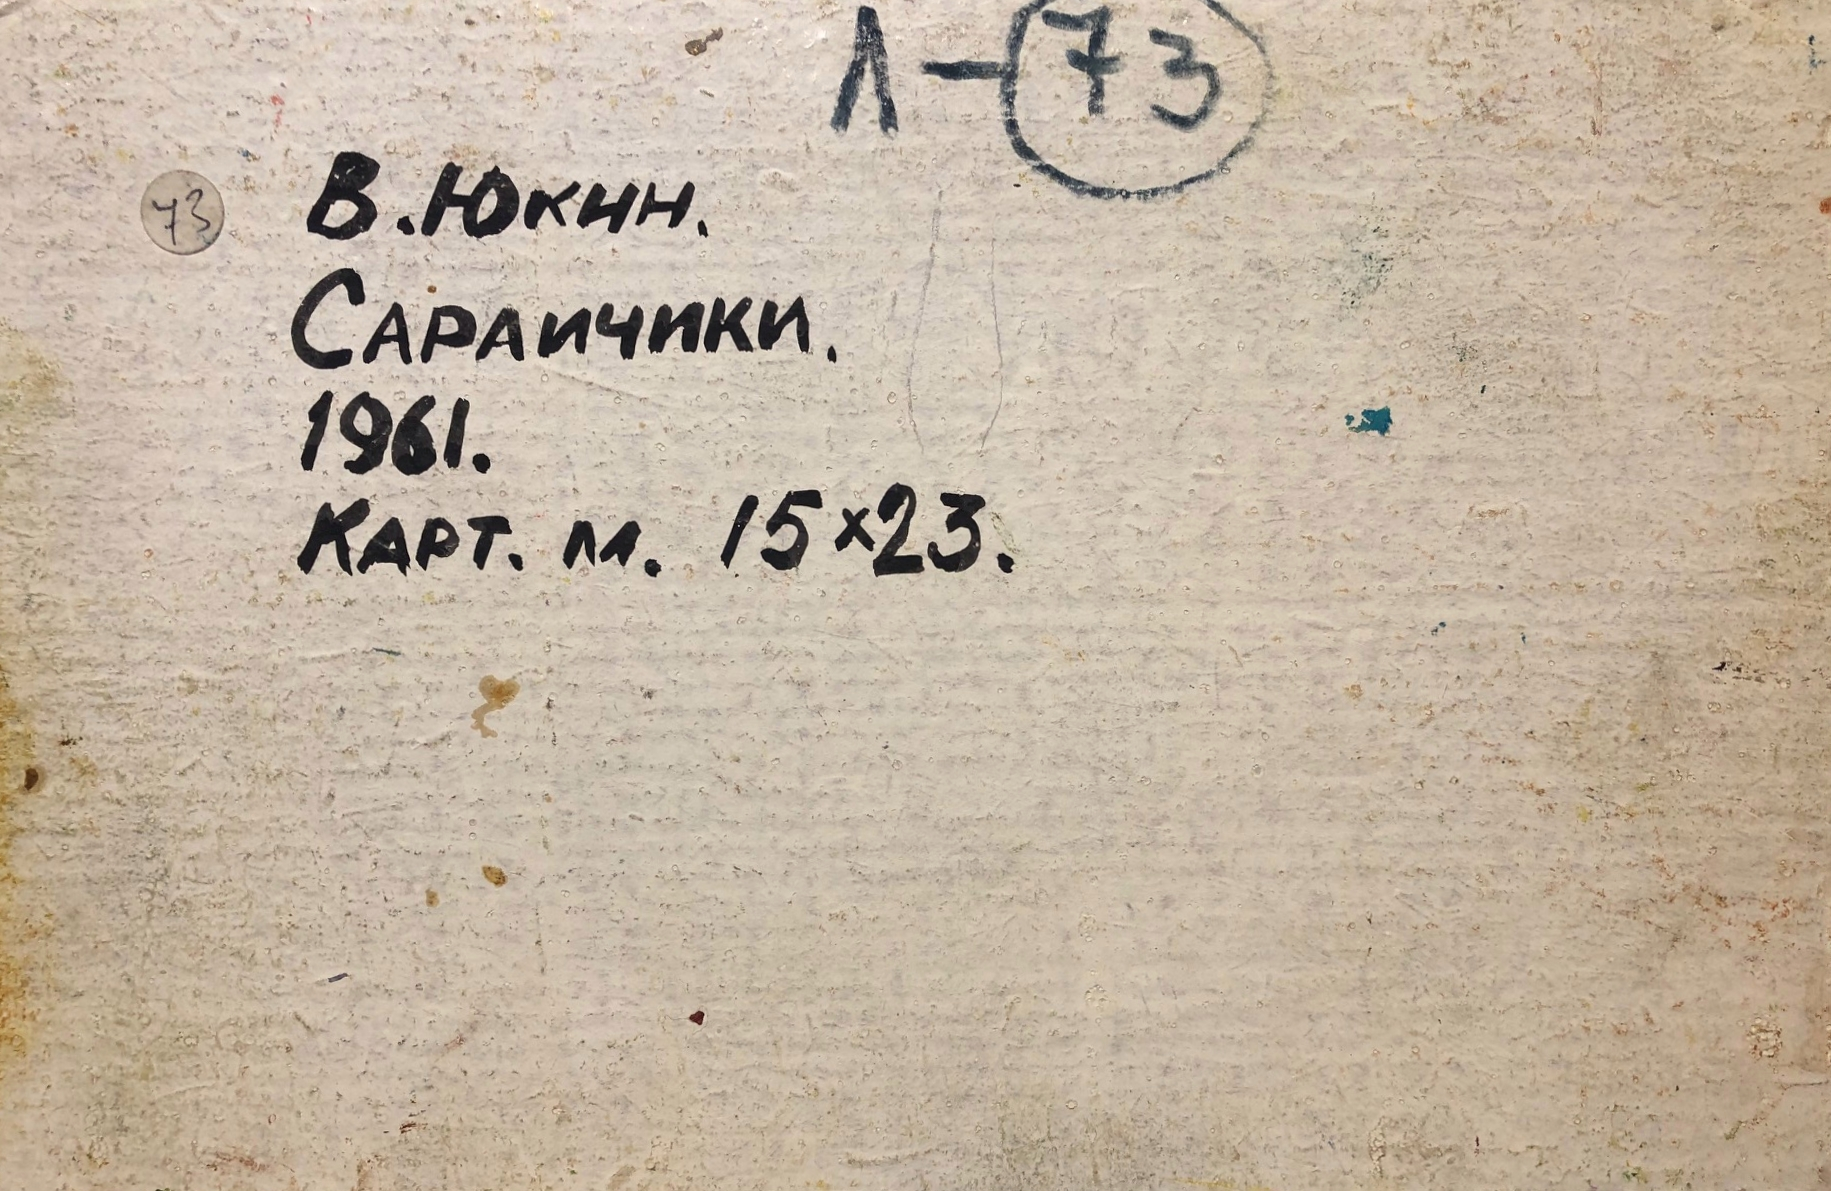 Оборот. Юкин Владимир Яковлевич. Сарайчики